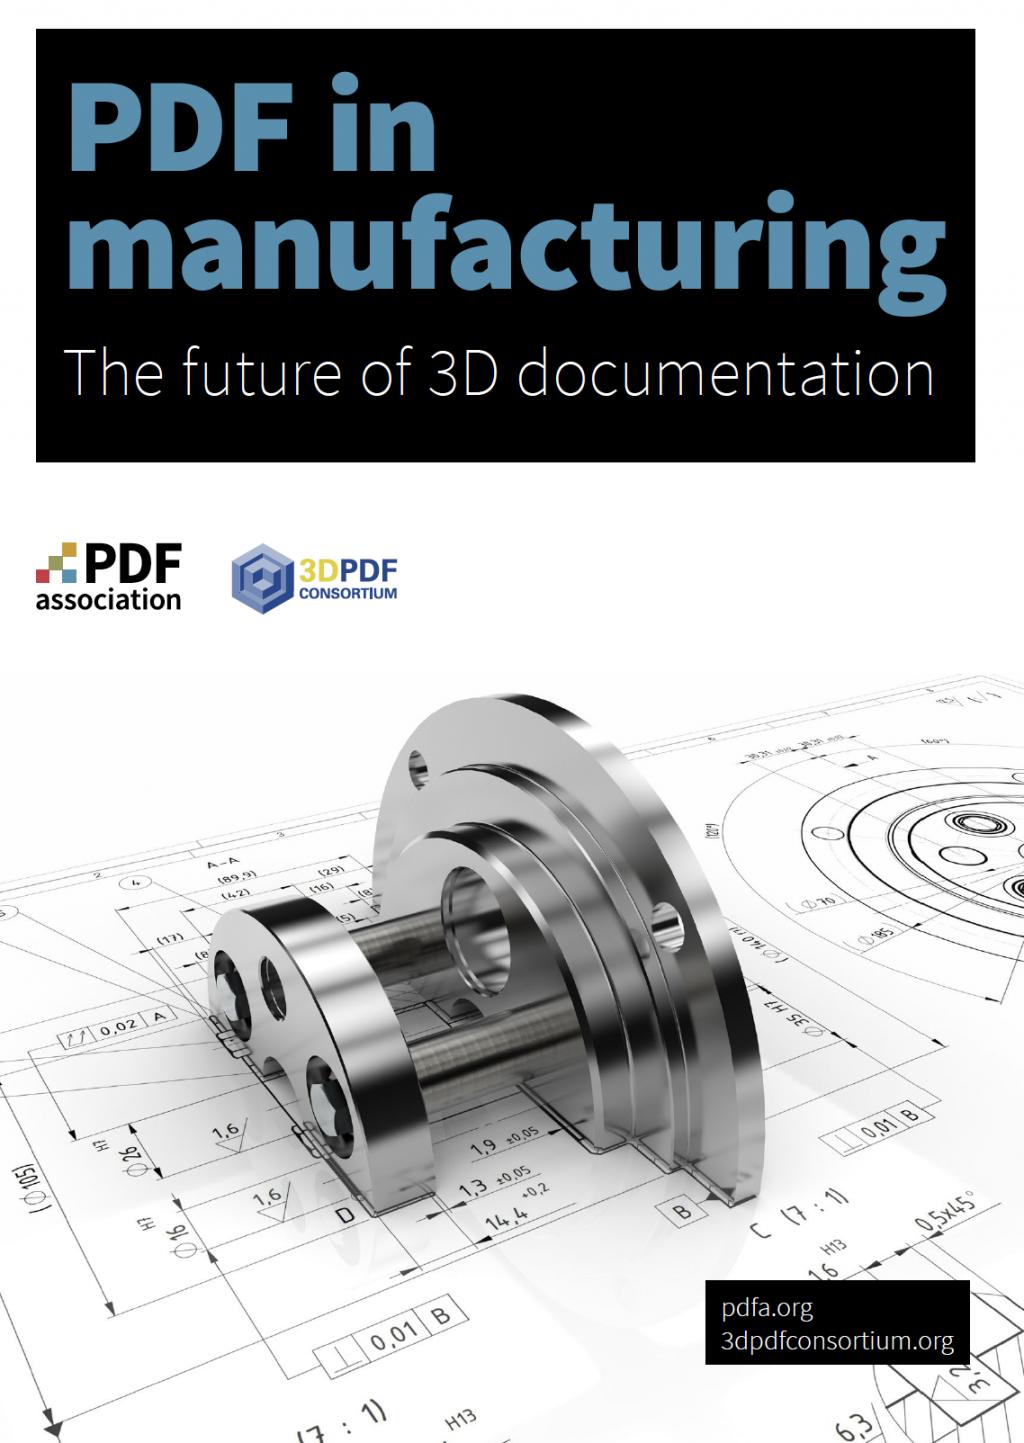 PDF in Manufacturing, cover